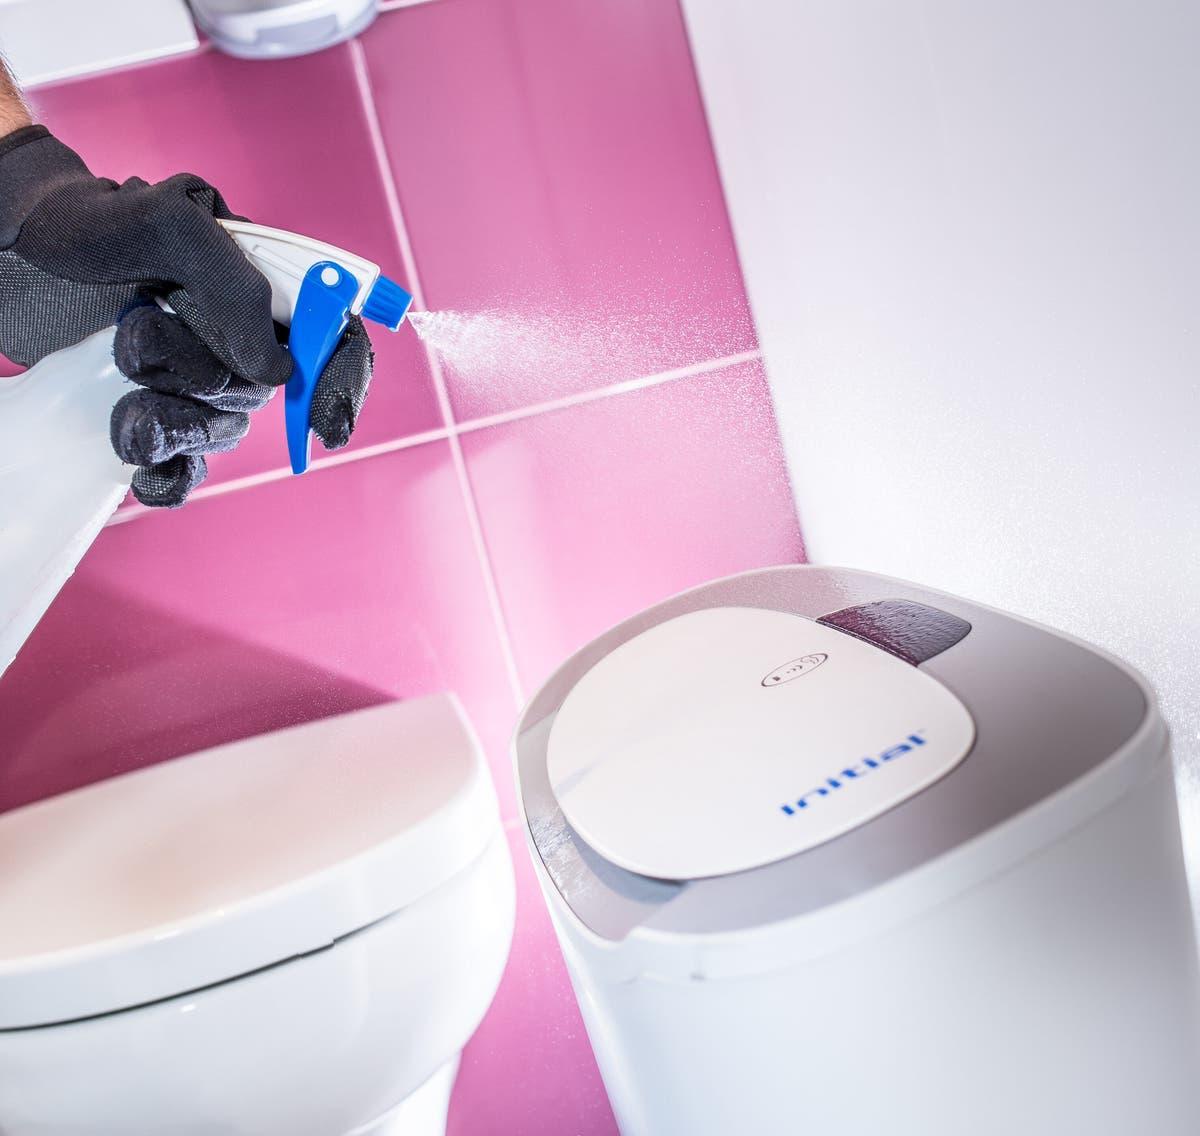 Rentokil lifts growth targets amid booming hygiene demand